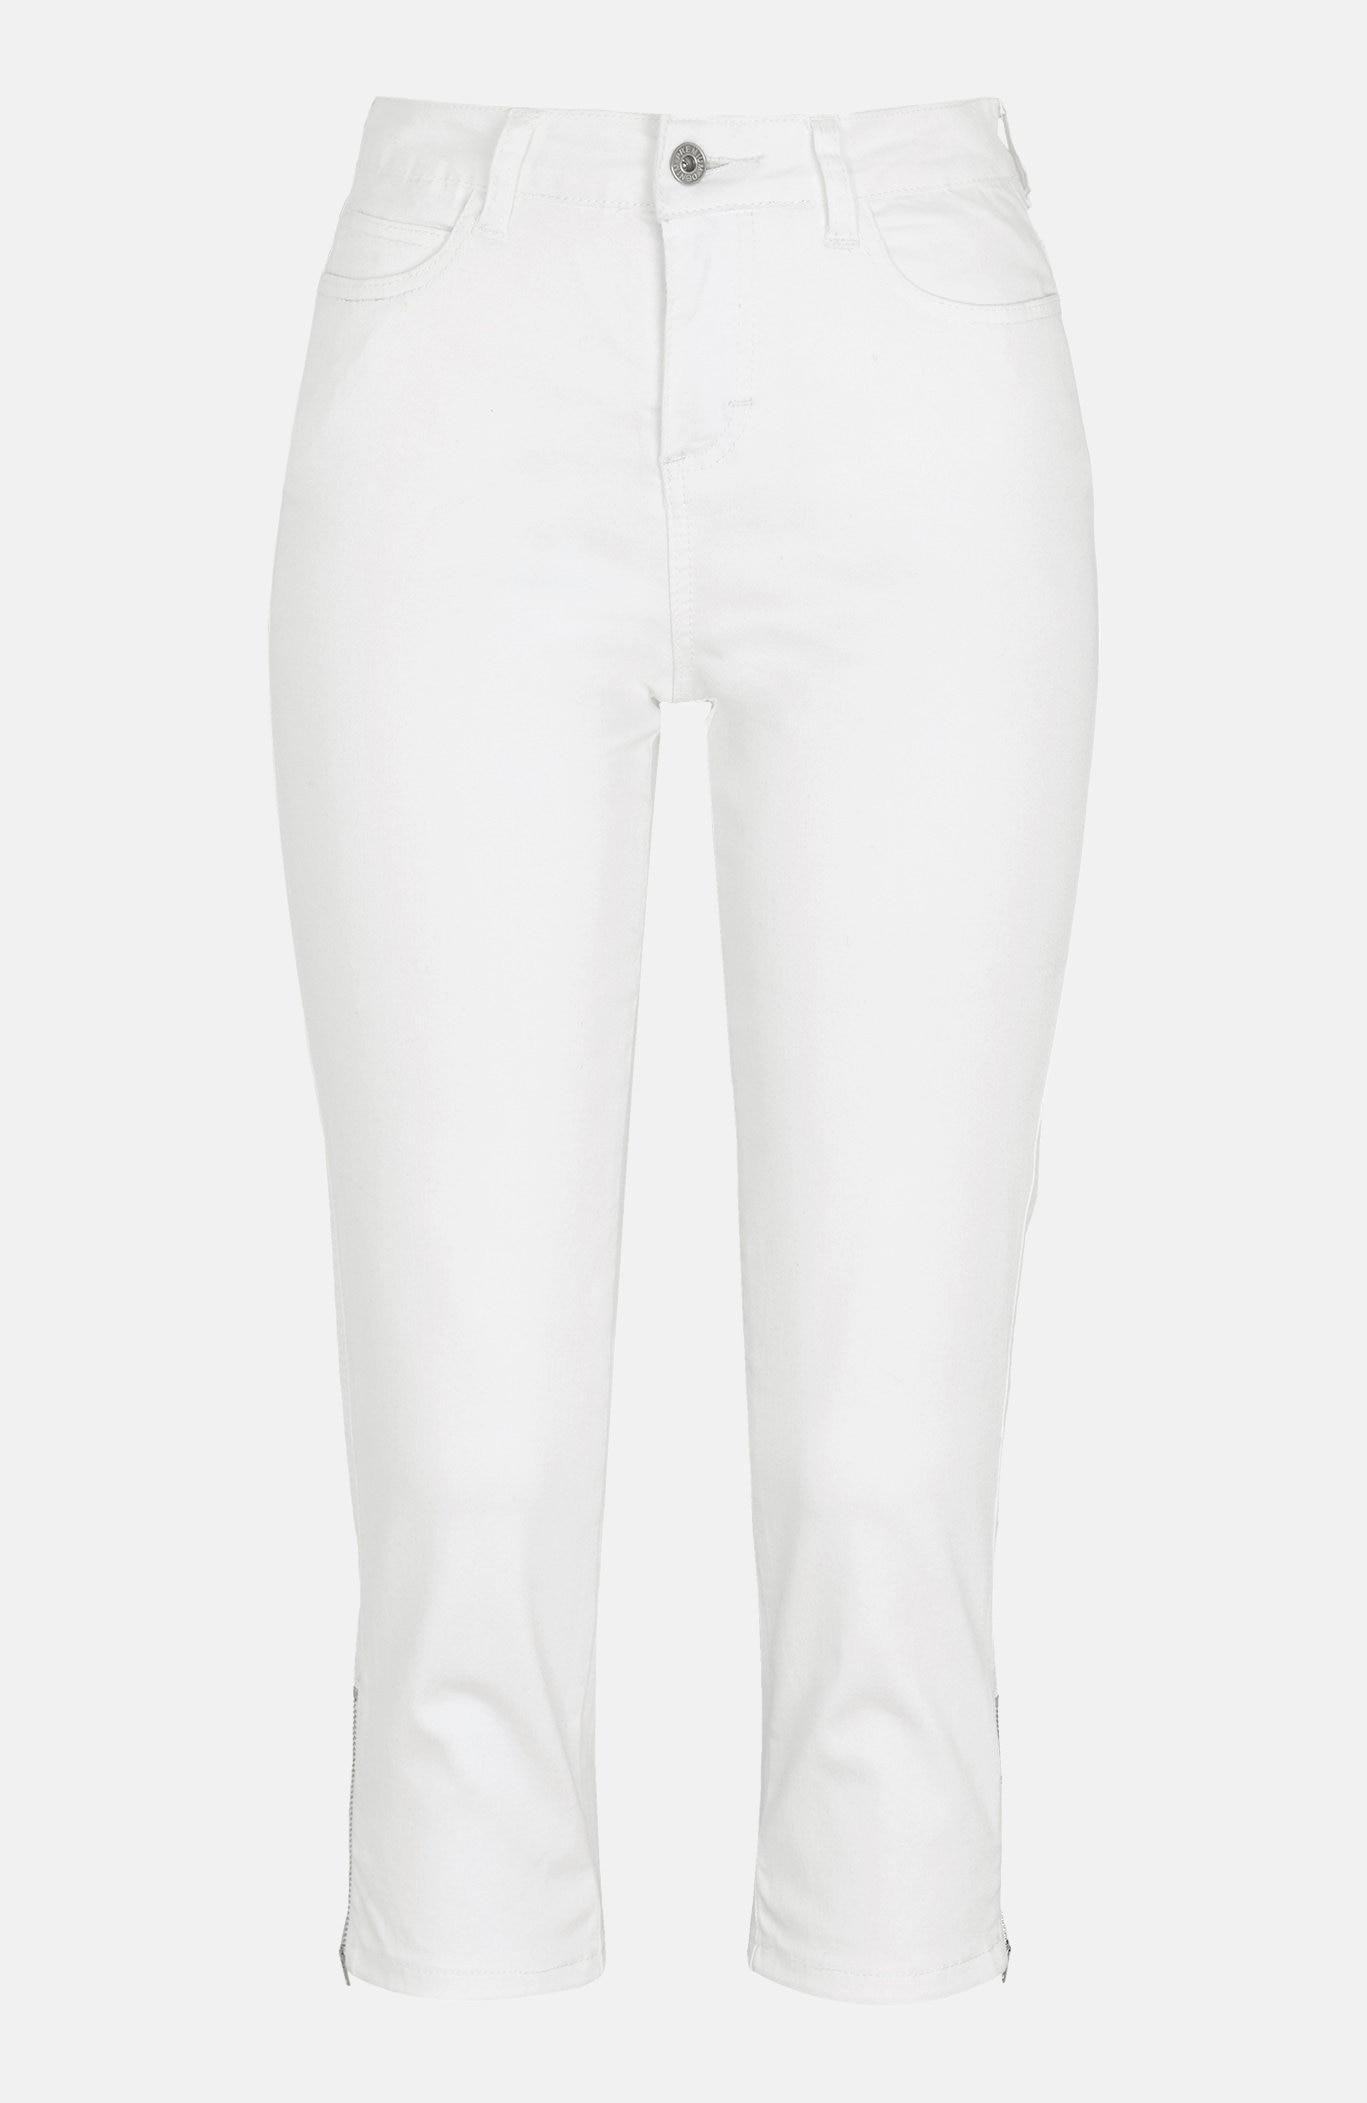 Capri kalhoty se zipem na lemu nohavic